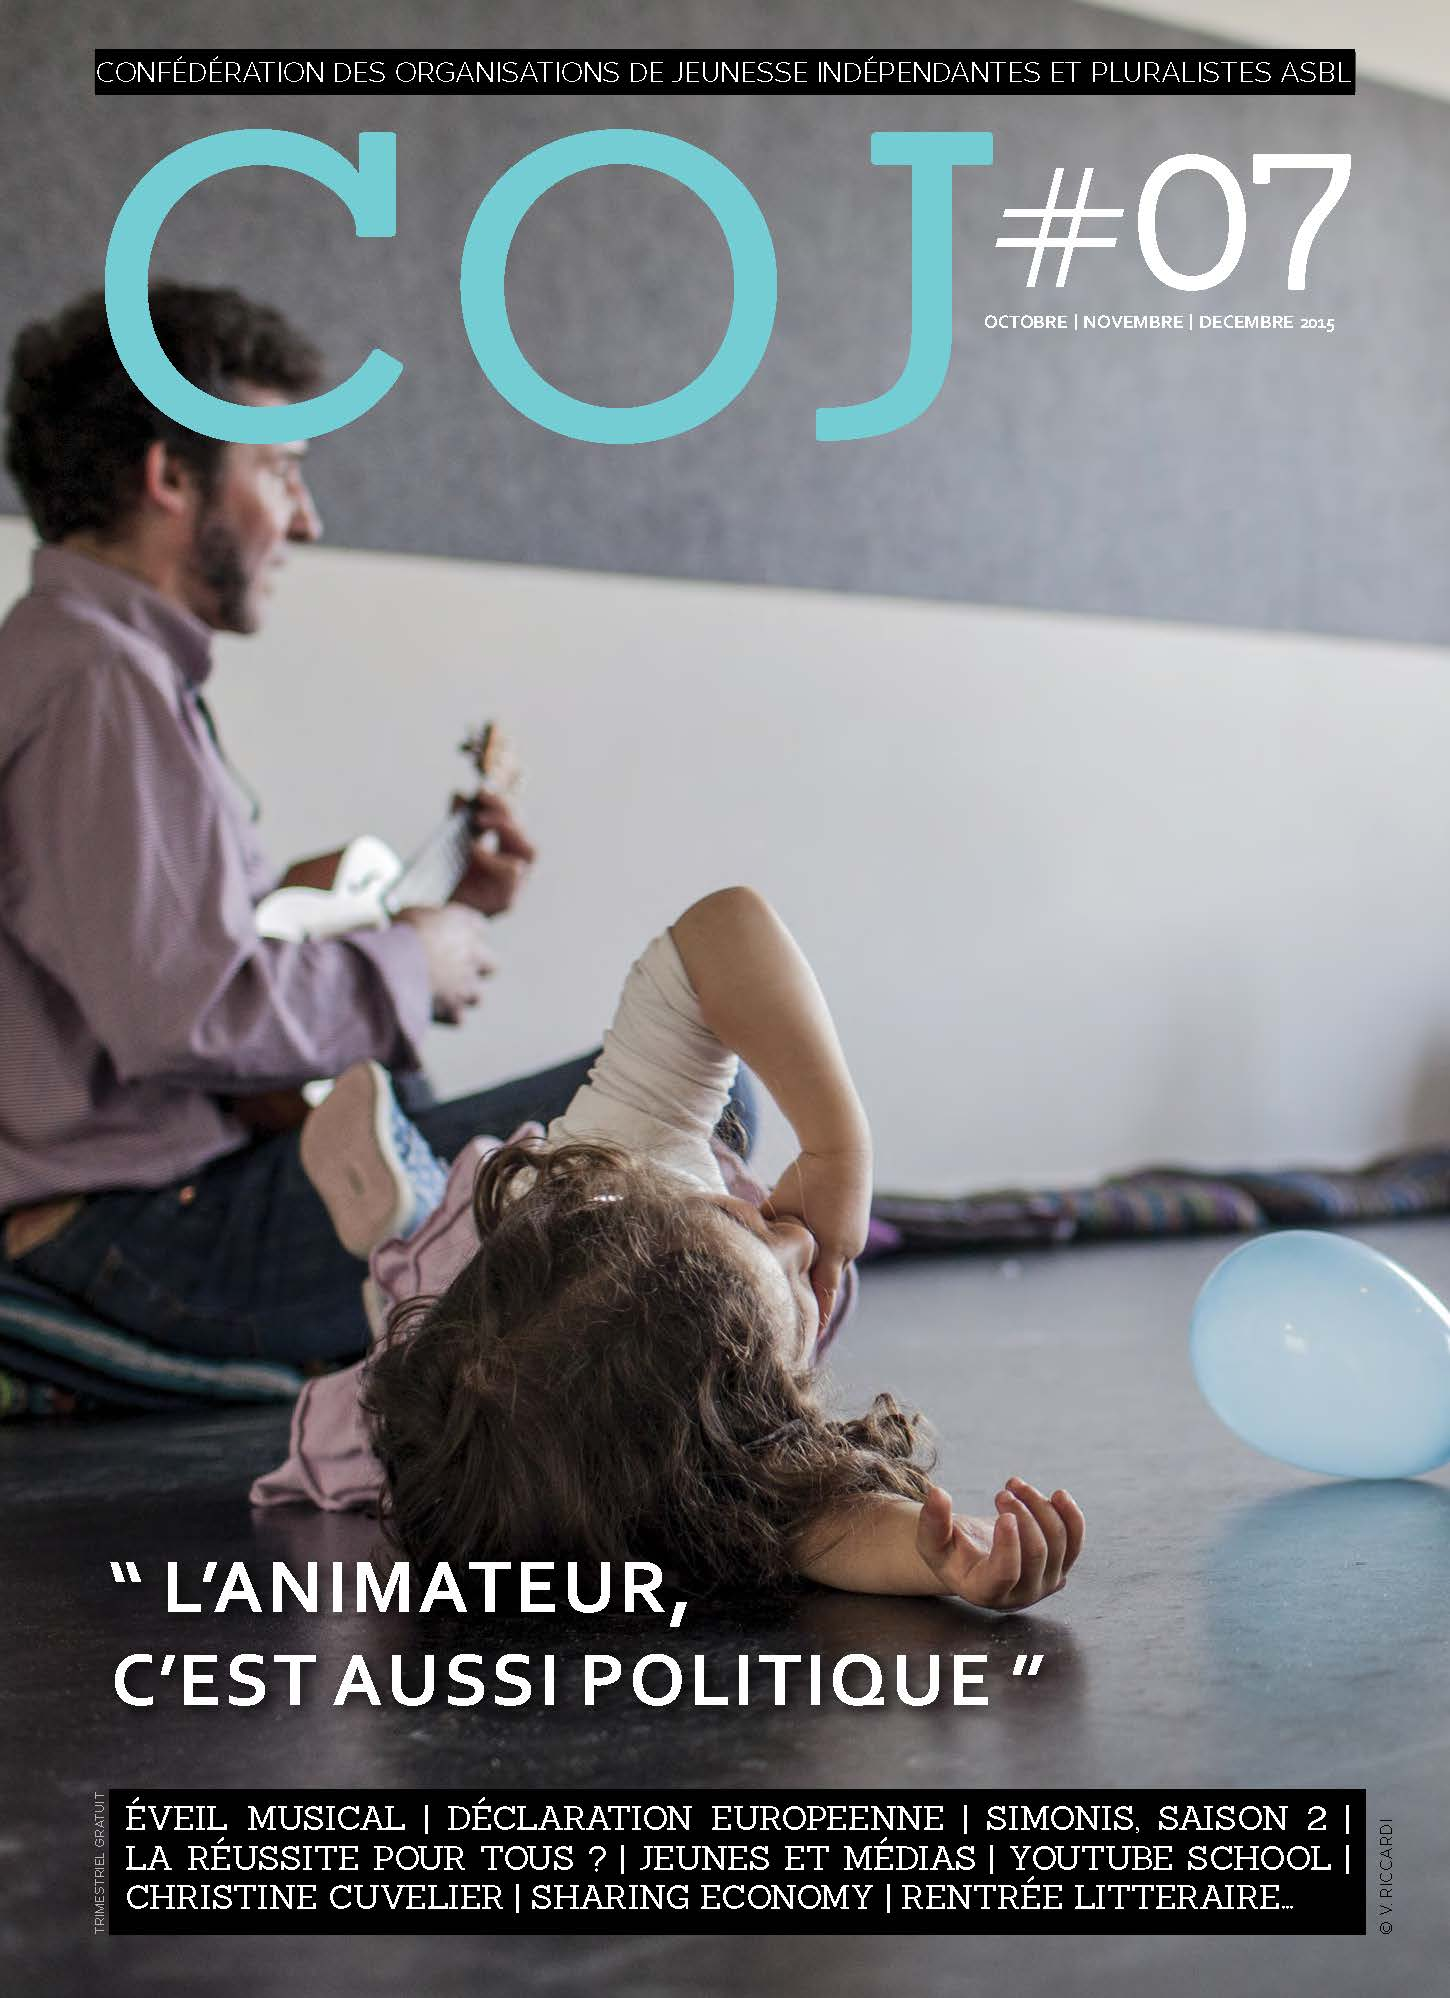 LE-COJ-07-2015-09-30-couv